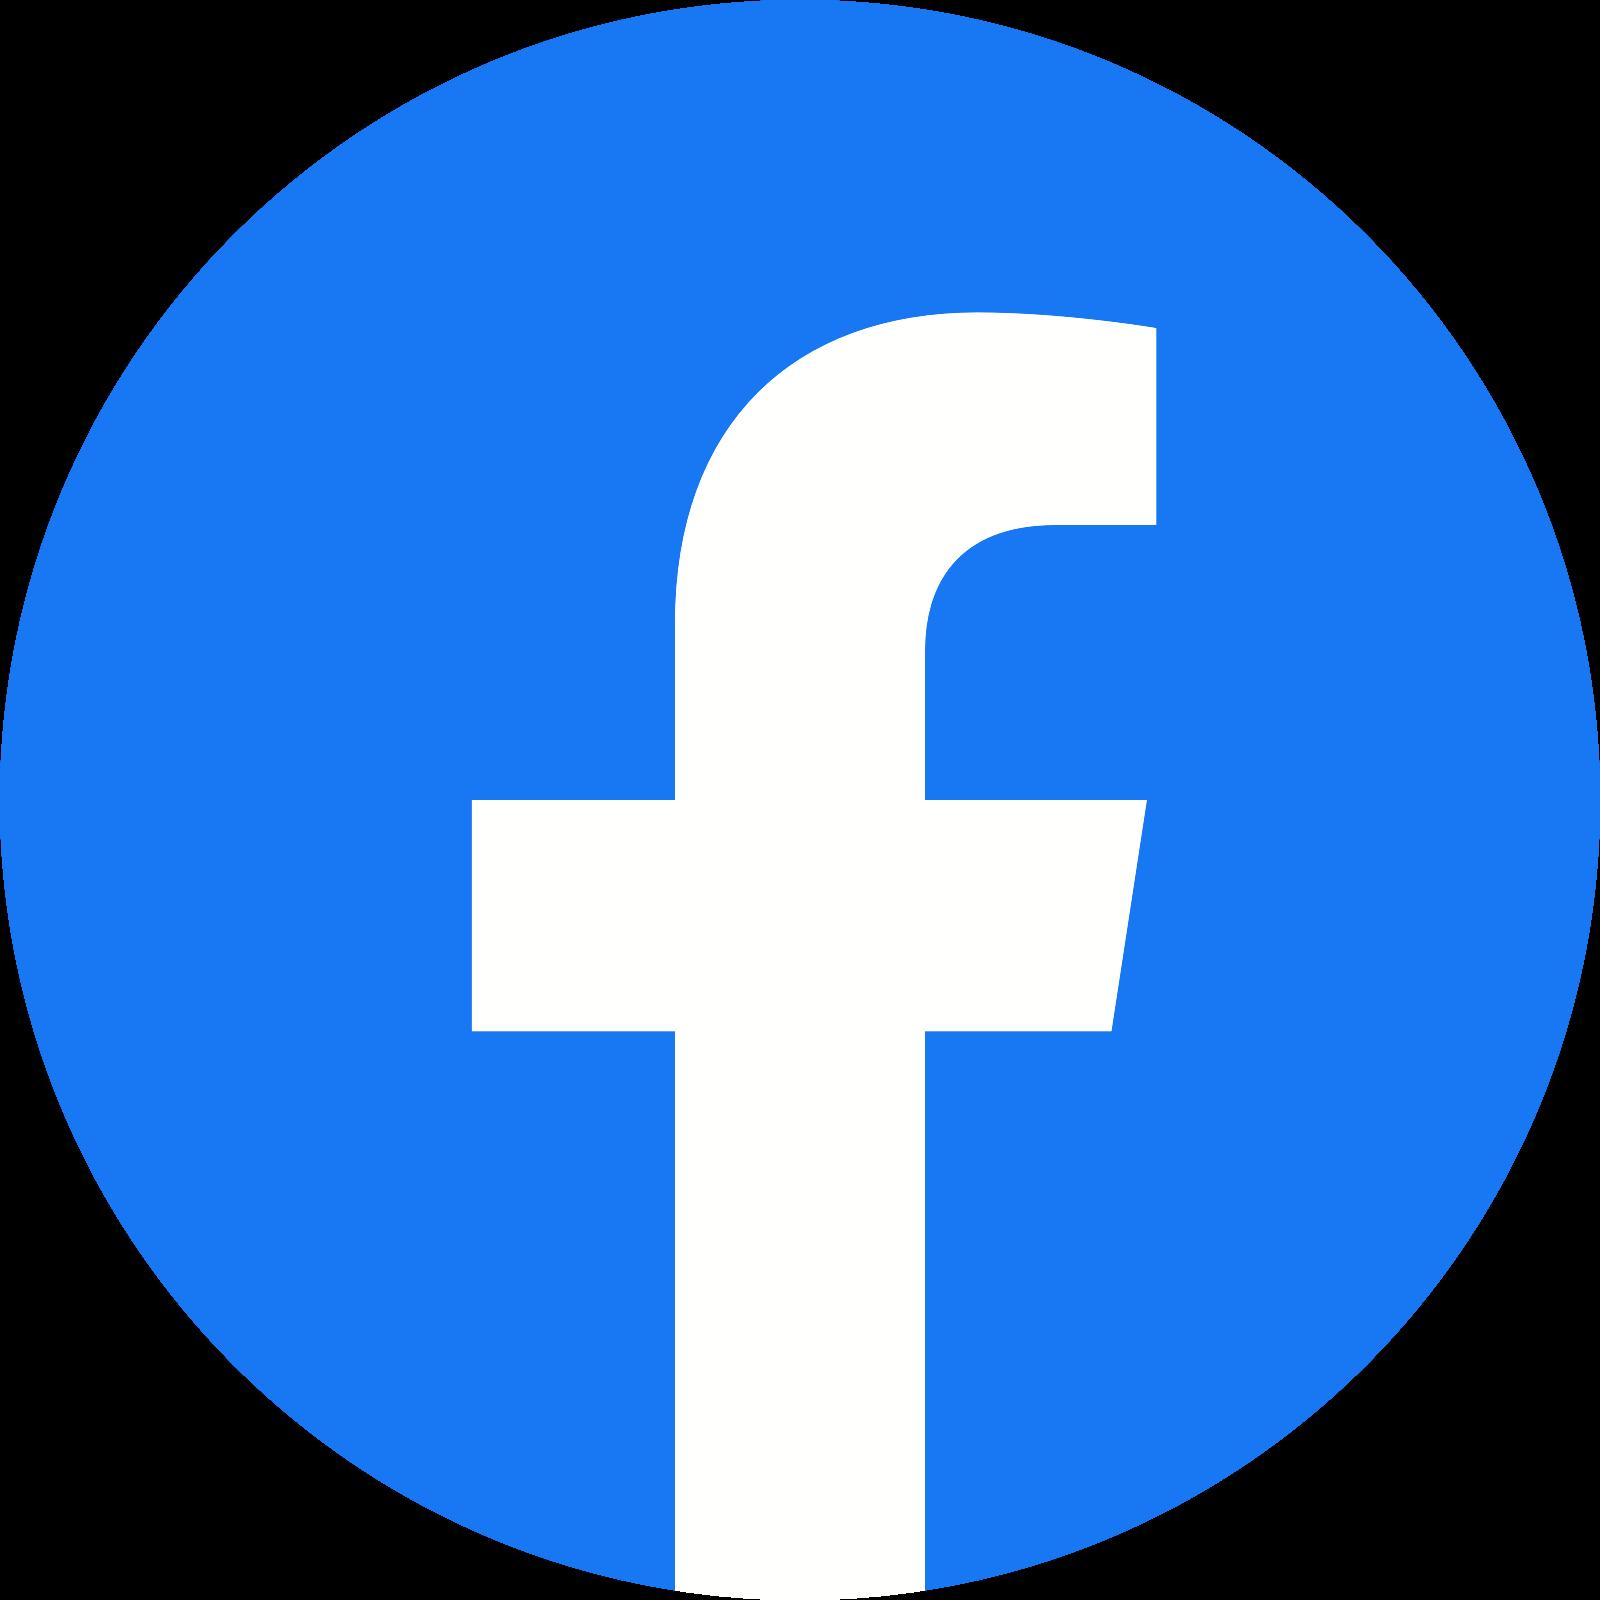 New Facebook Logo 2019 PNG Transparent & SVG Vector - Freebie Supply